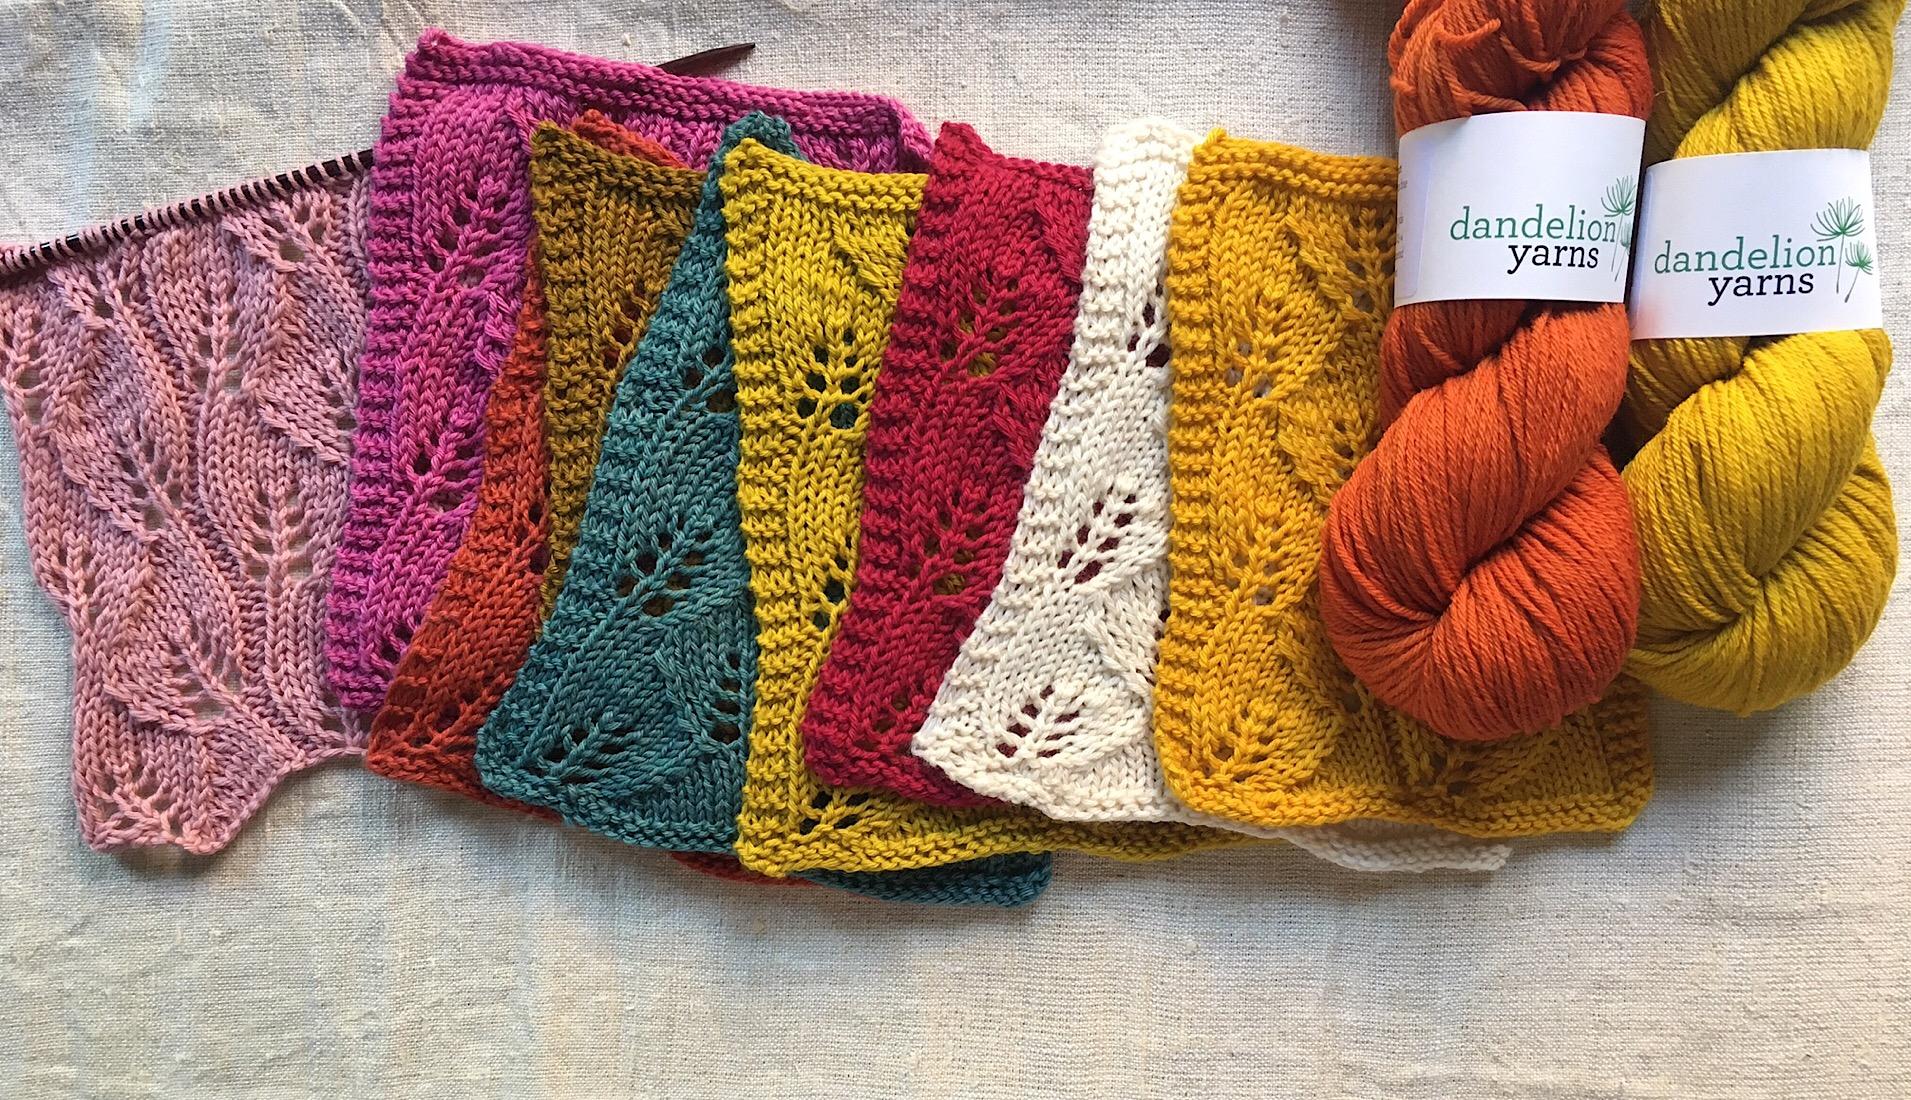 New Yarn Alert: Dandelion Rosy Sport